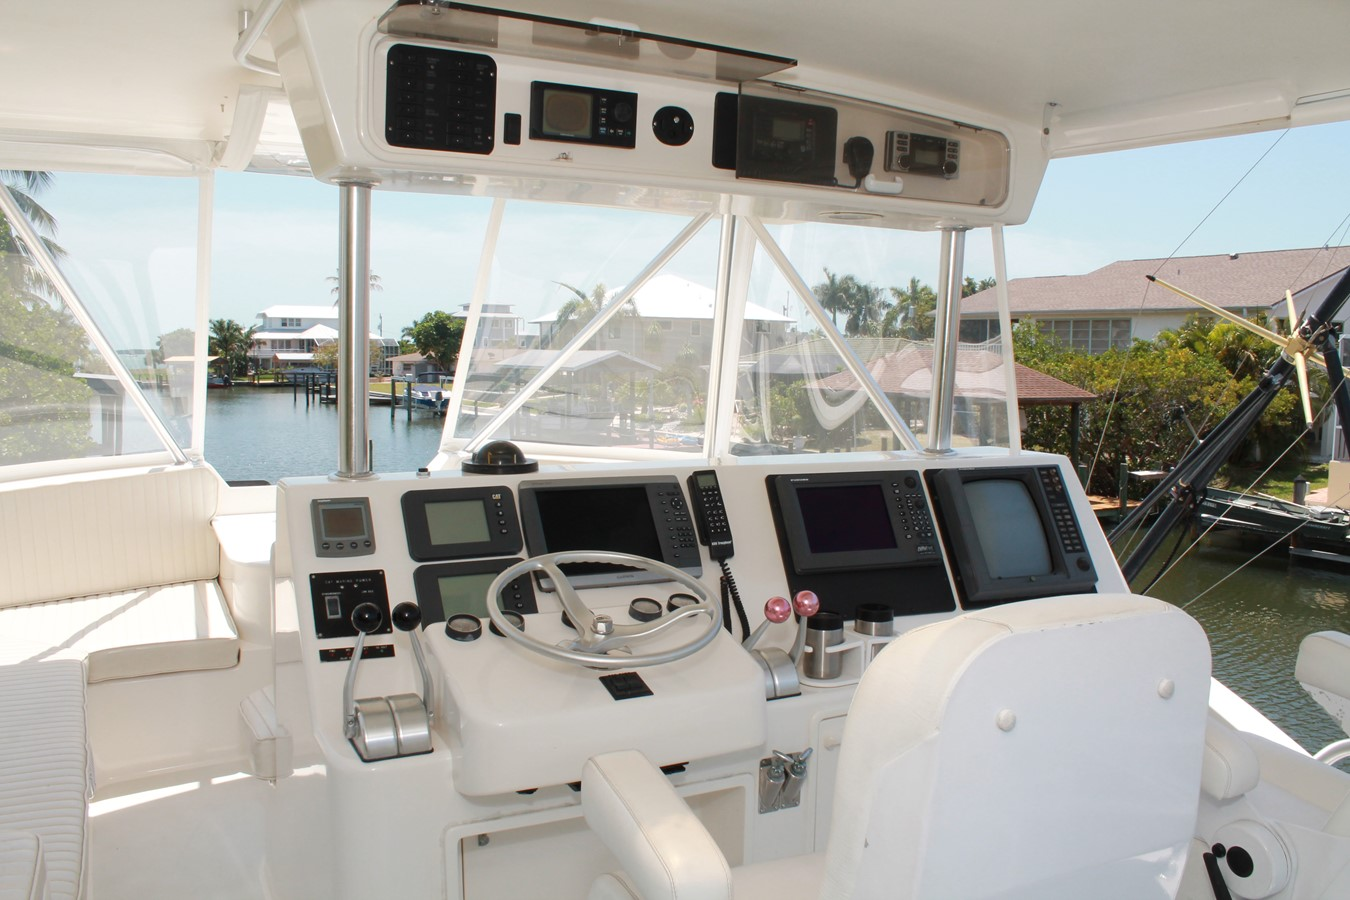 Ocean Yachts 52 Super Sport 2001 For Sale In St James City Florida